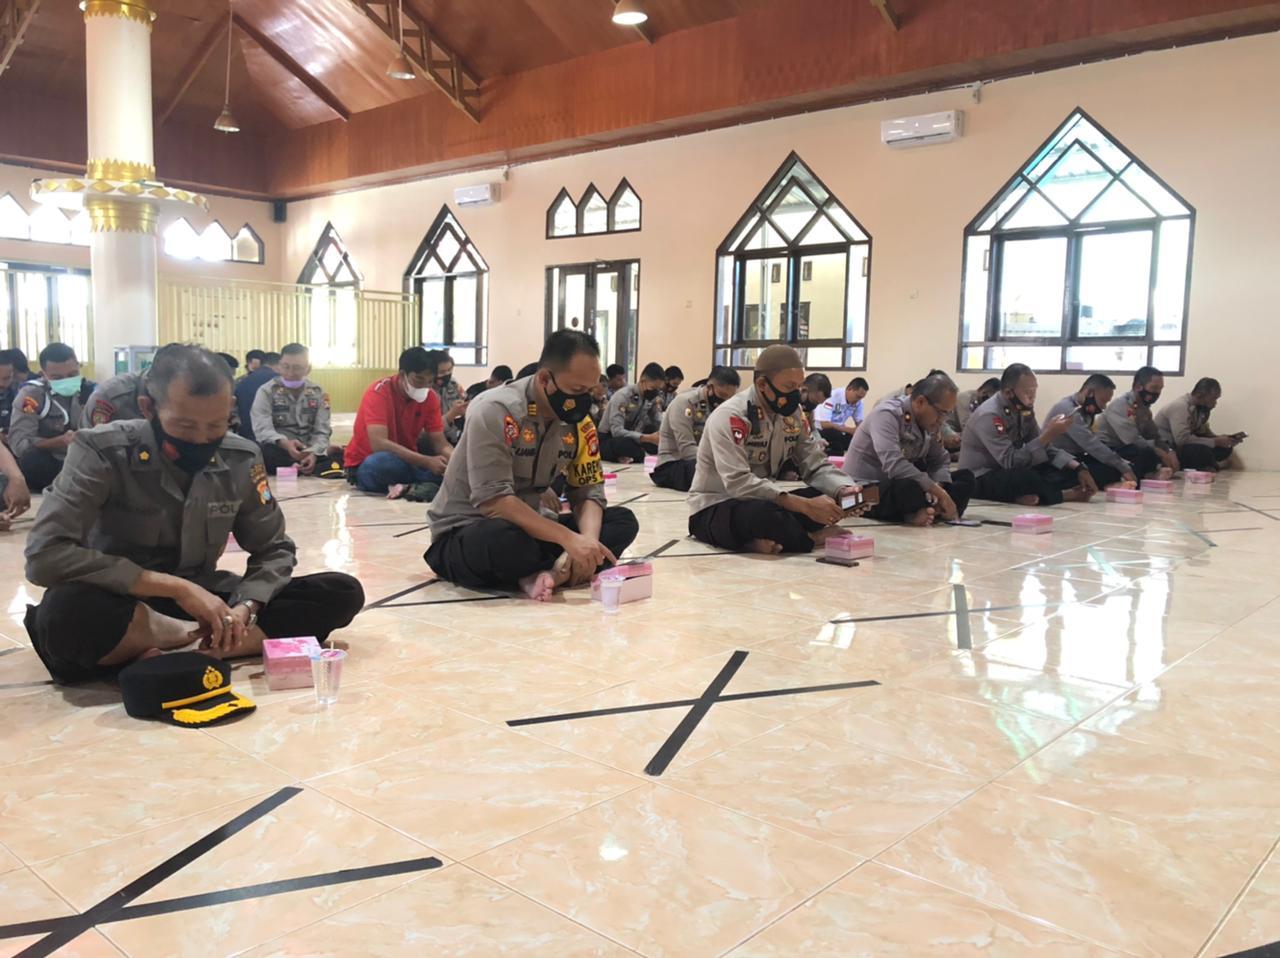 Binrohtal Polres Majene : Semangat Ramadhan Harus kita Pertahankan Hingga Akhir Hayat